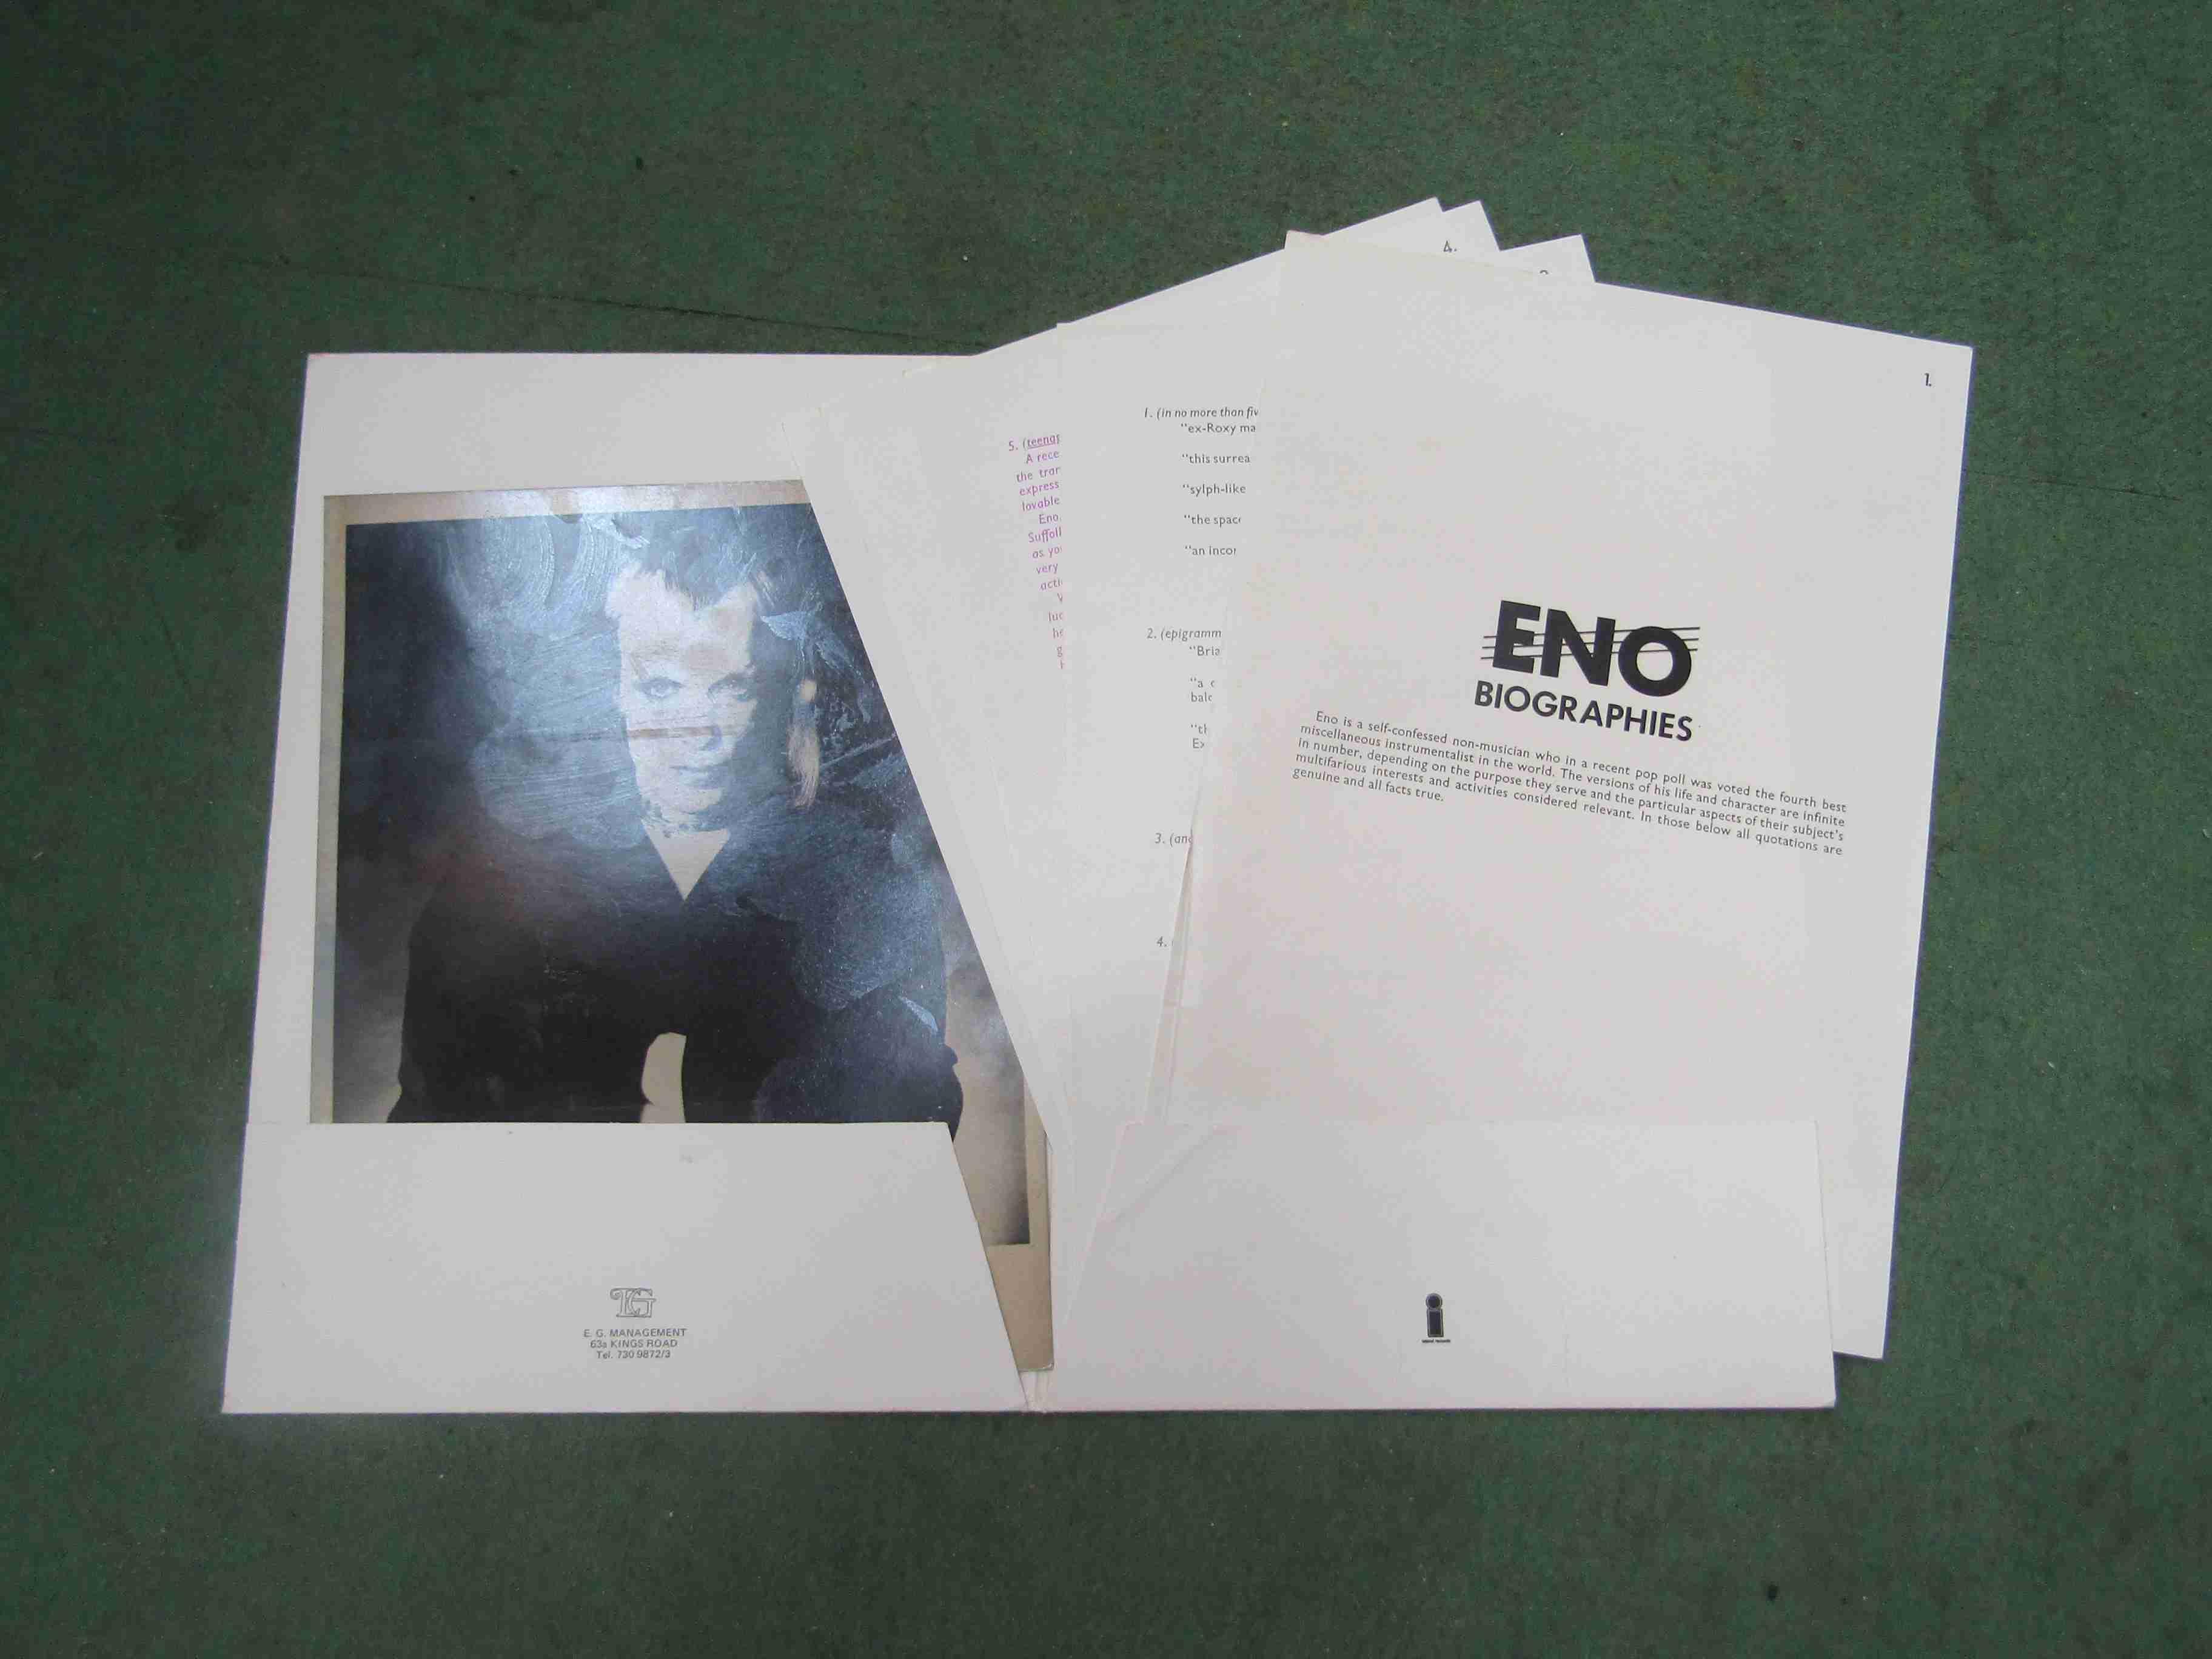 BRIAN ENO: An Island Records Eno press kit including promo photograph, - Image 2 of 2